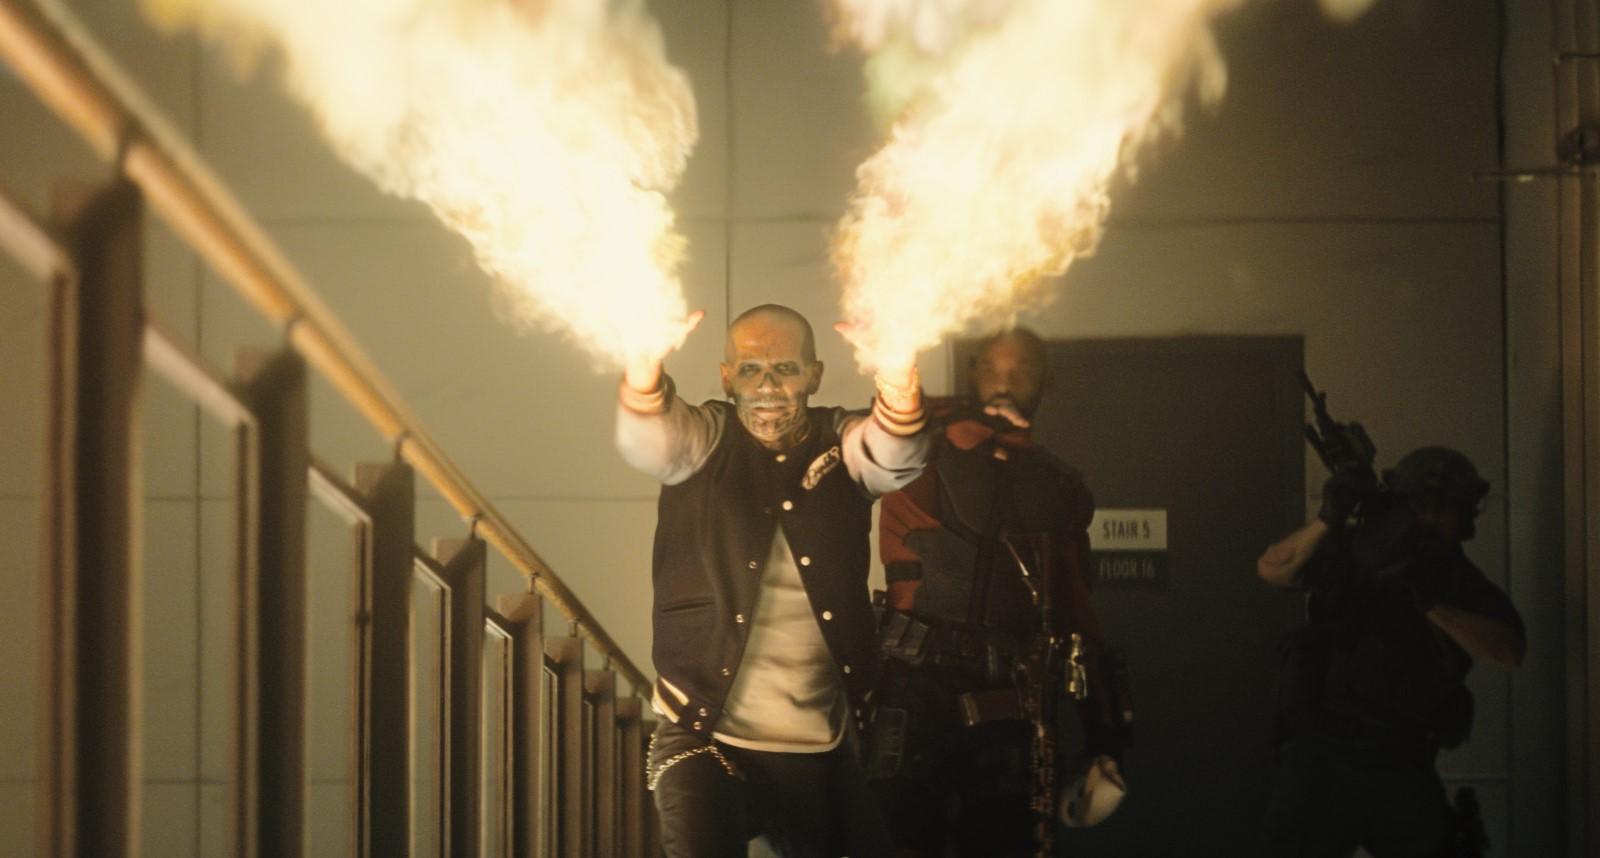 Diablo (Jay Hernandez) possesses some impressive firepower.